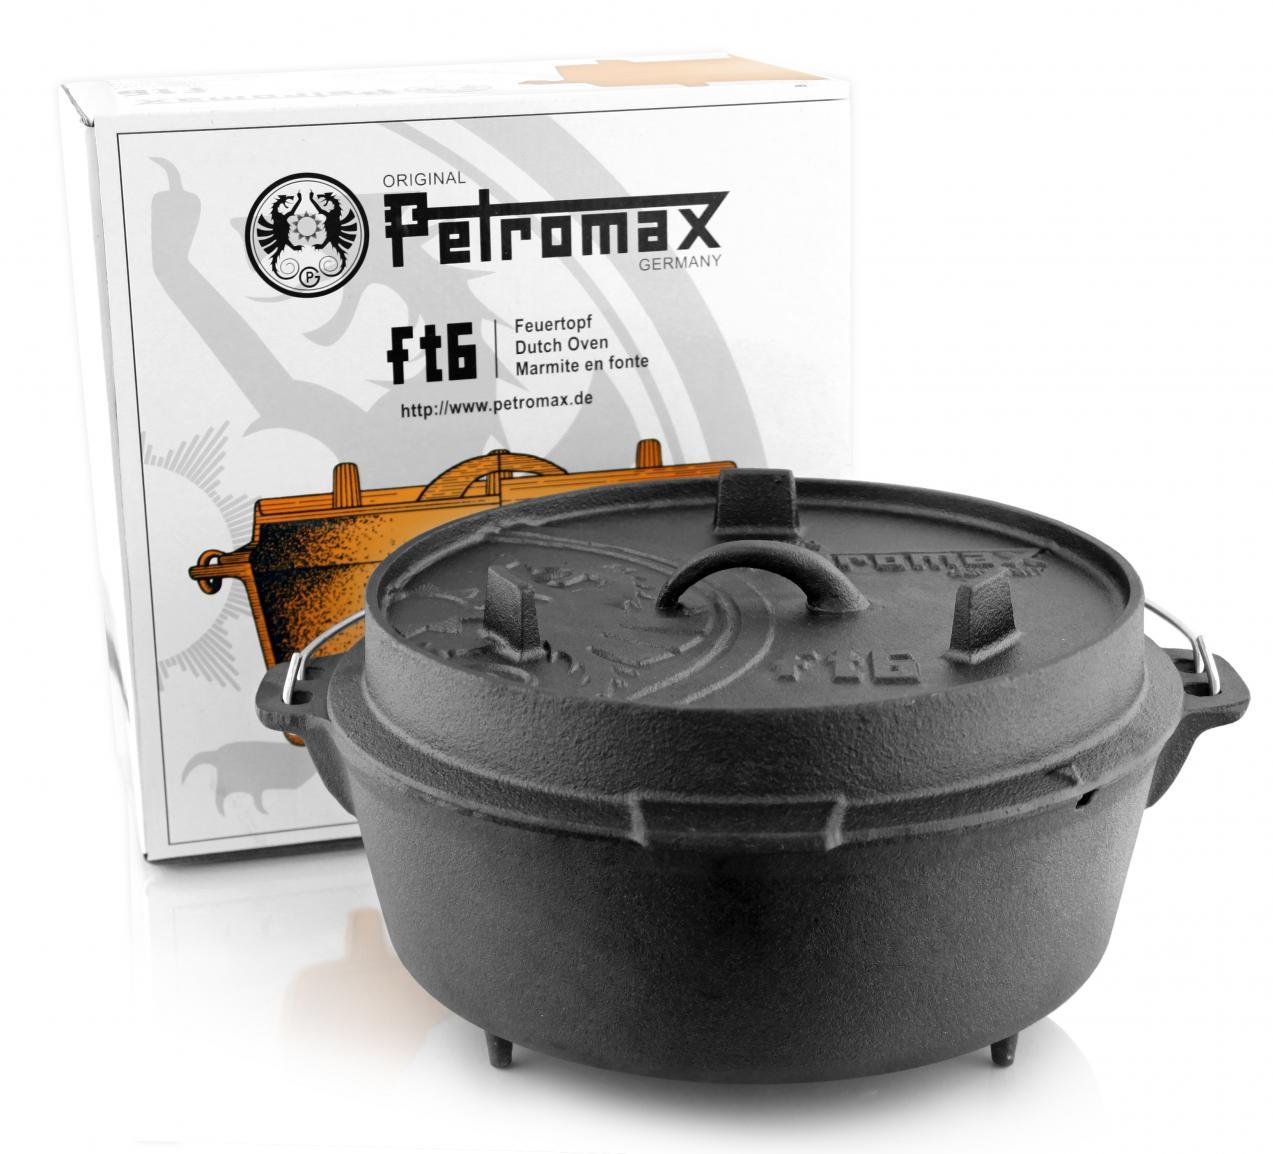 Petromax Dutch Oven ft6 ohne Füße